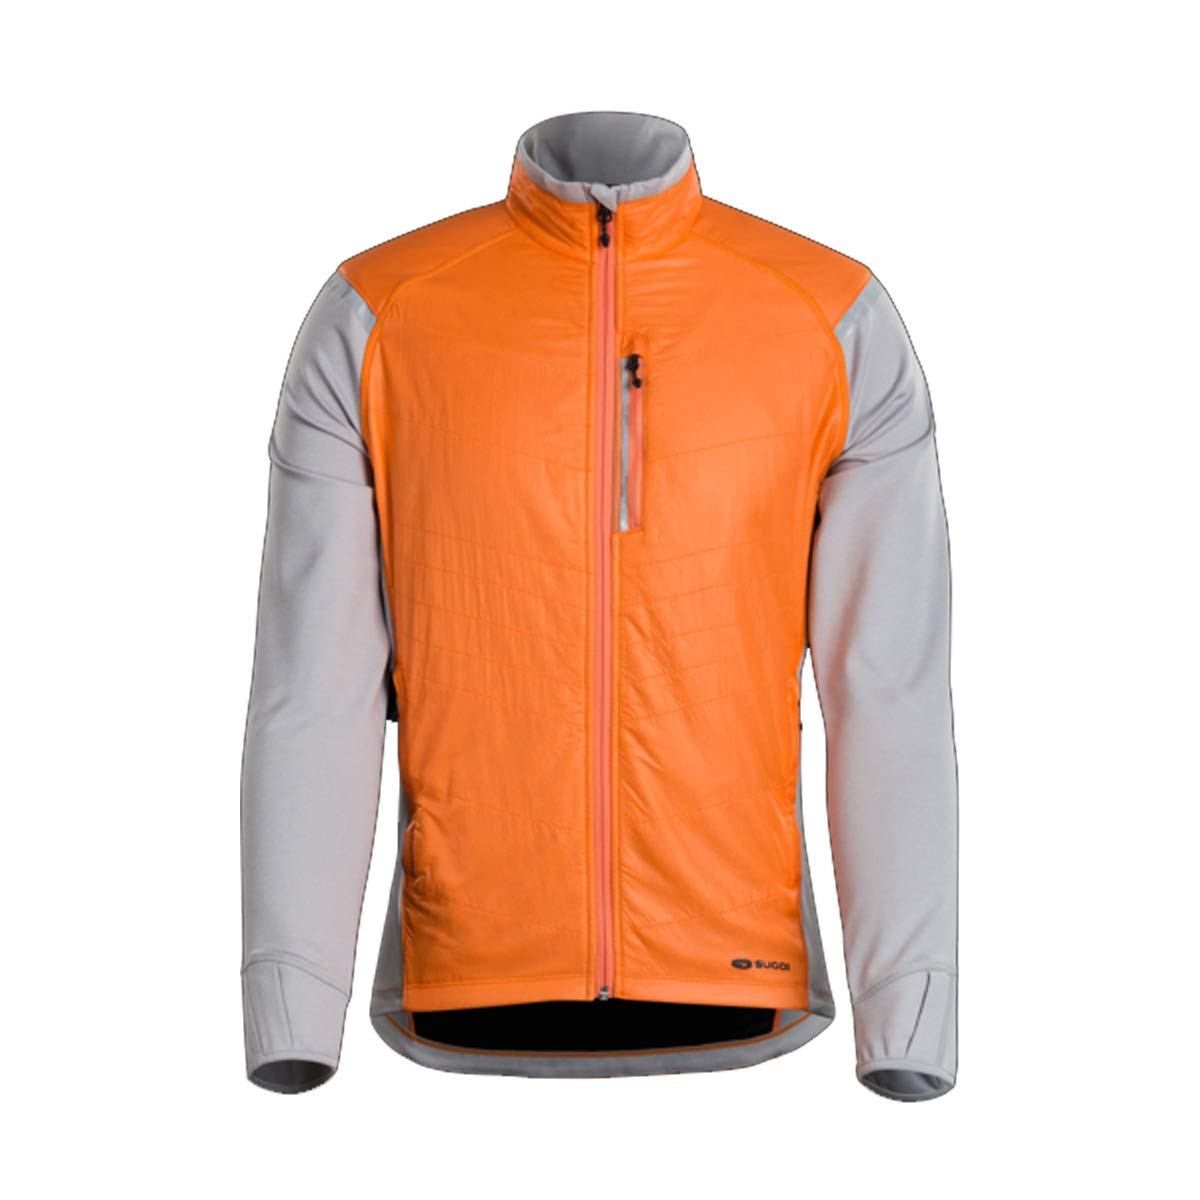 SUGOi 2018 メンズ アルファハイブリッド 自転車トレーニングジャケット - U740000M B07KBF6XRZ  ネクタリン Large